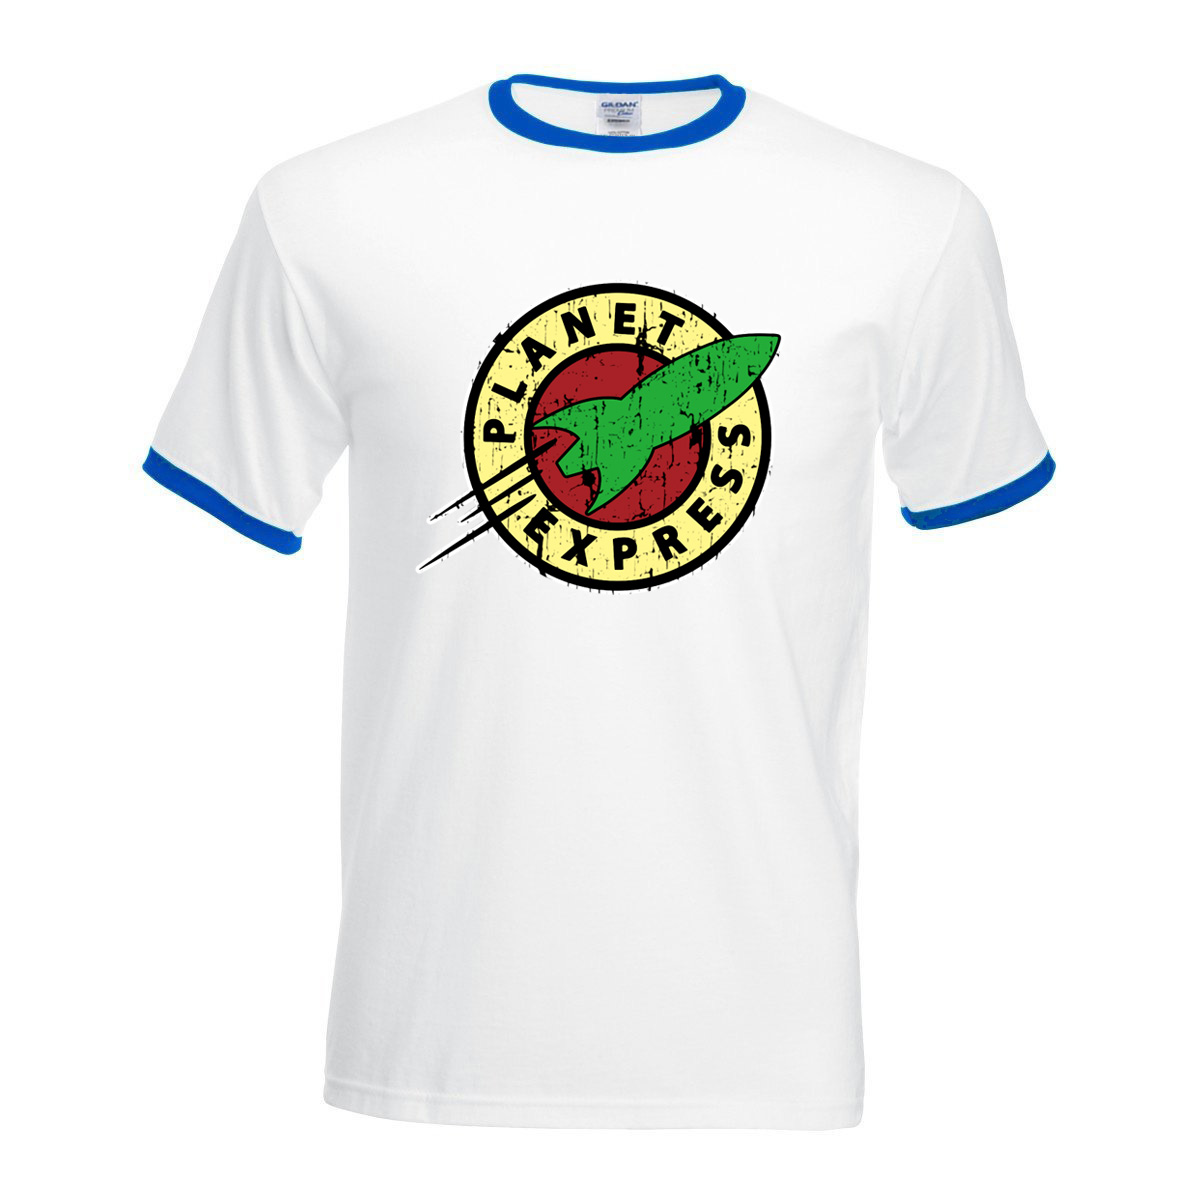 Aliexpress.com : Buy new arrival hit color t shirts men planet ...